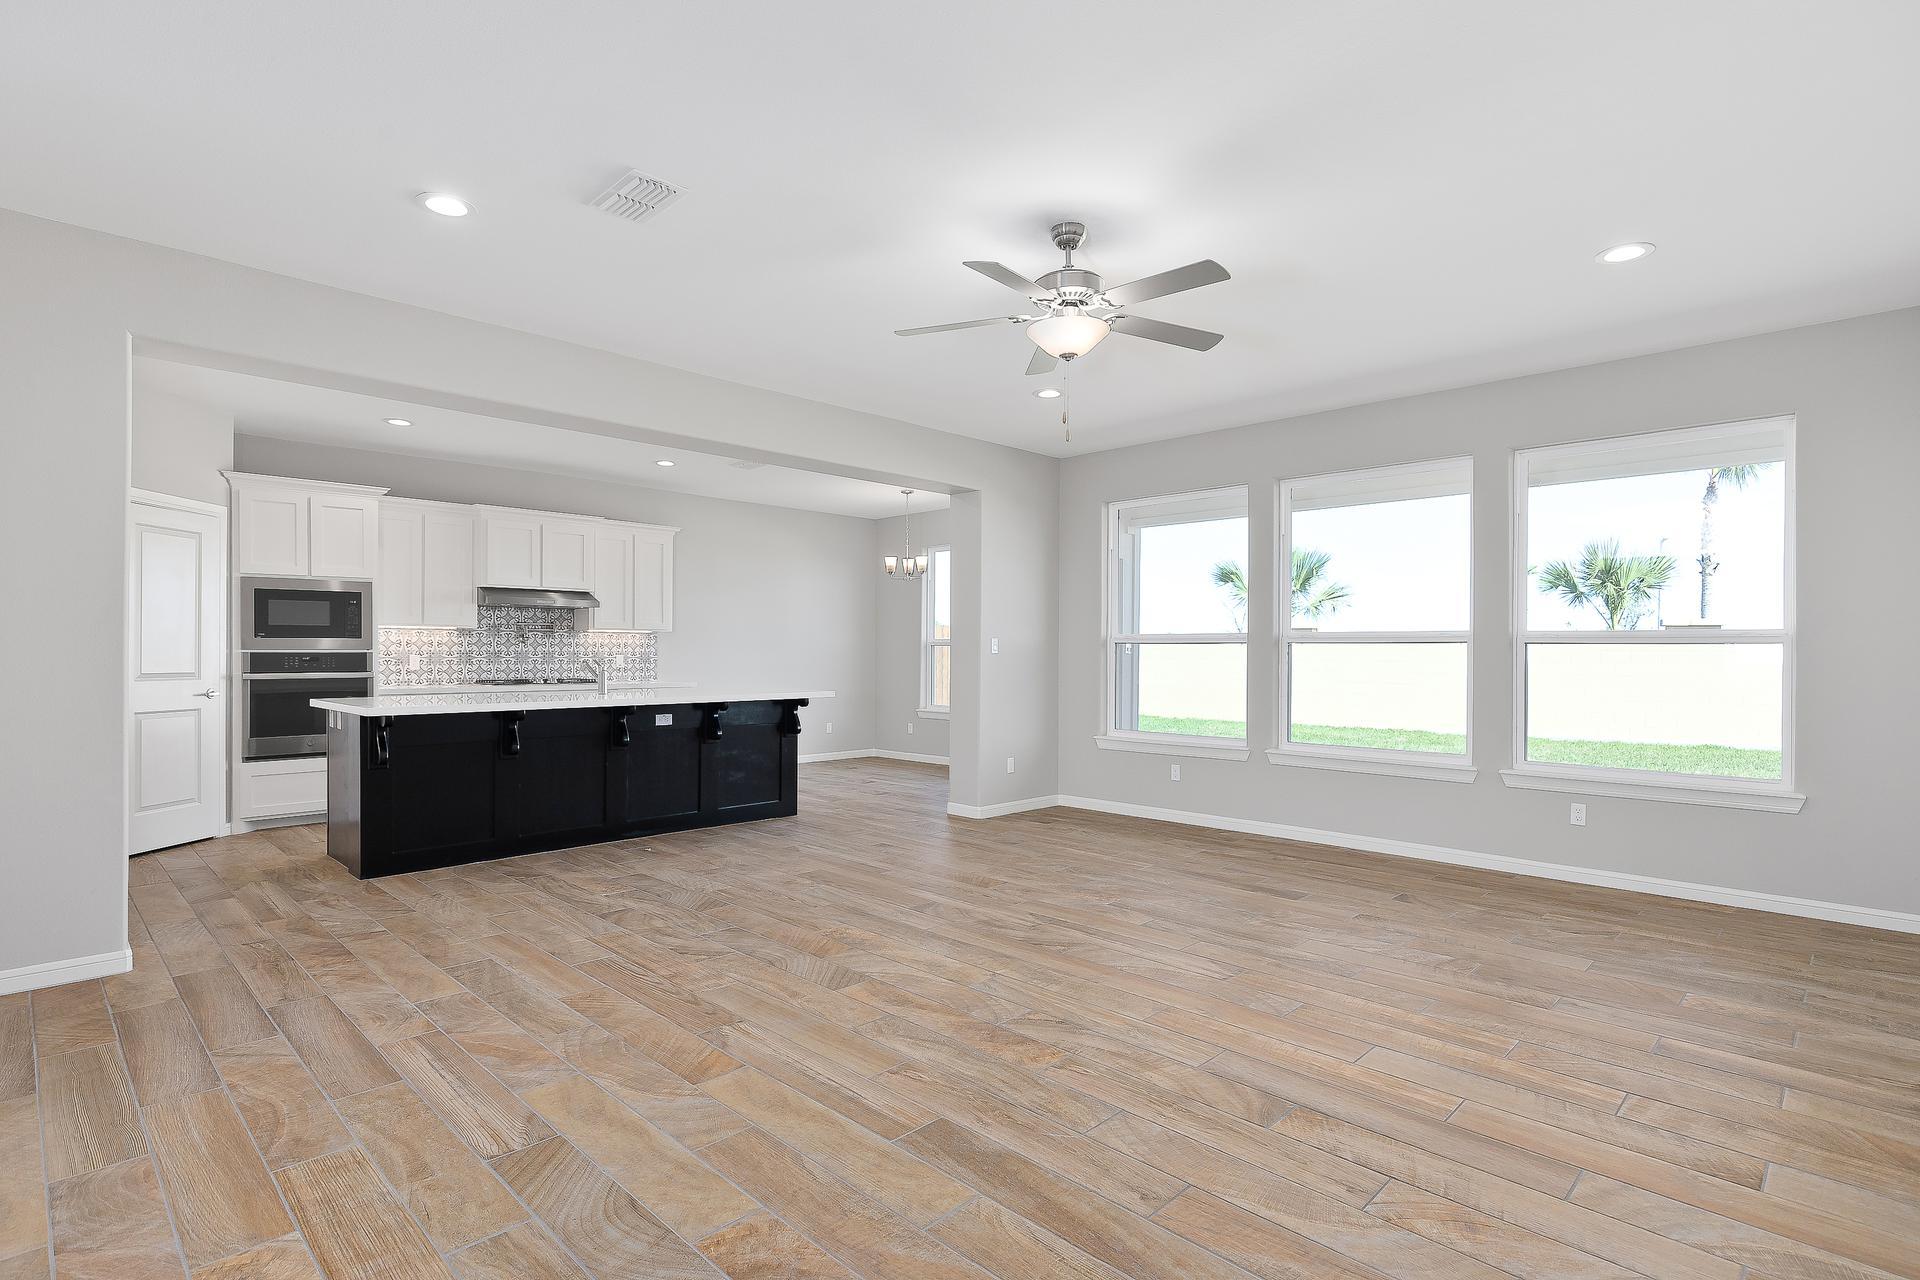 The Espada new home in McAllen TX